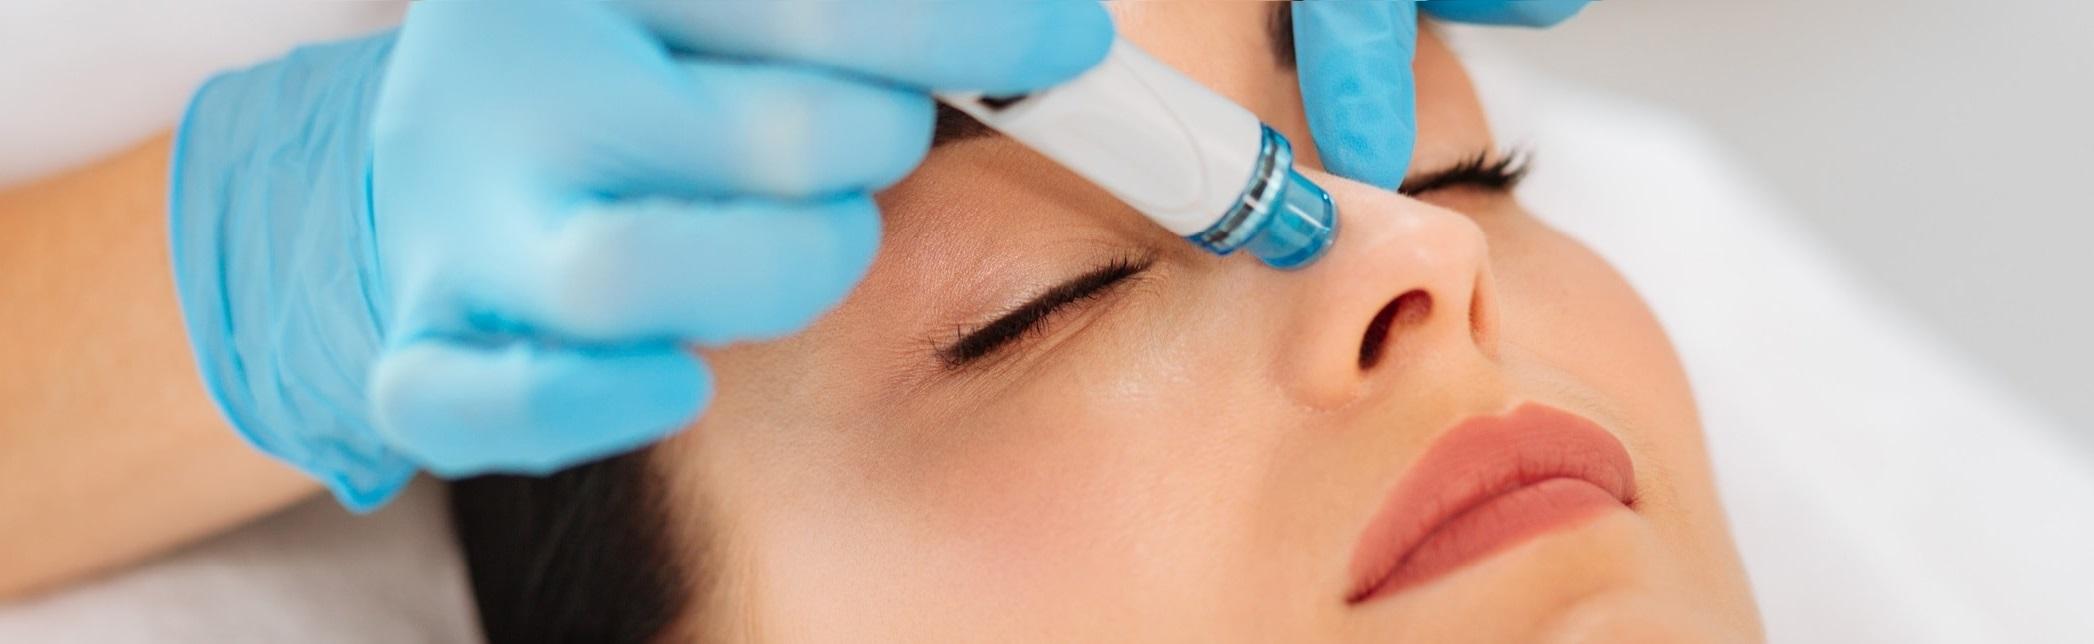 hydrafacial treatment and training